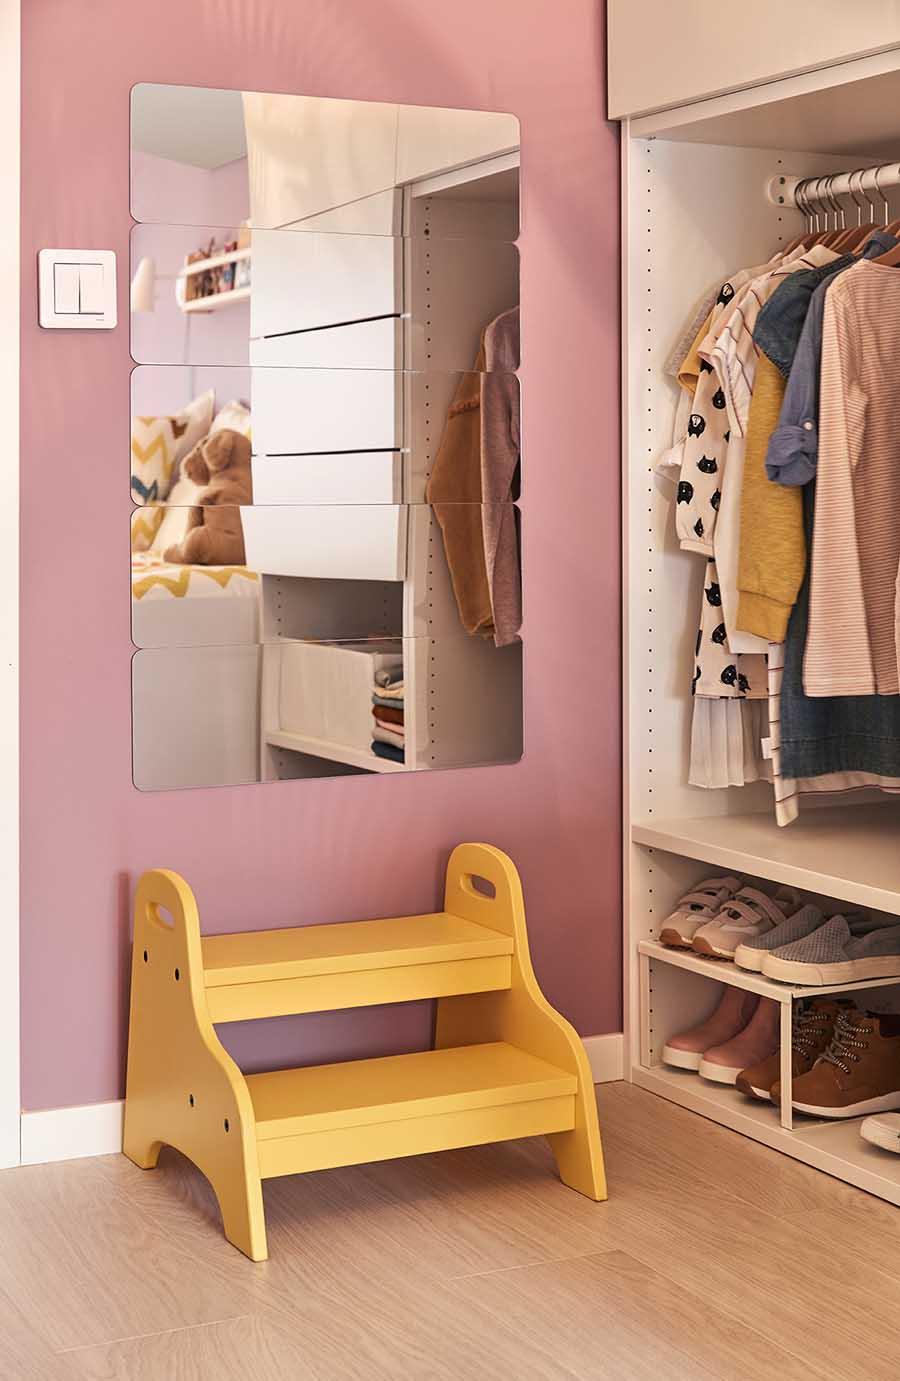 dormitorios infantiles ikea 2020